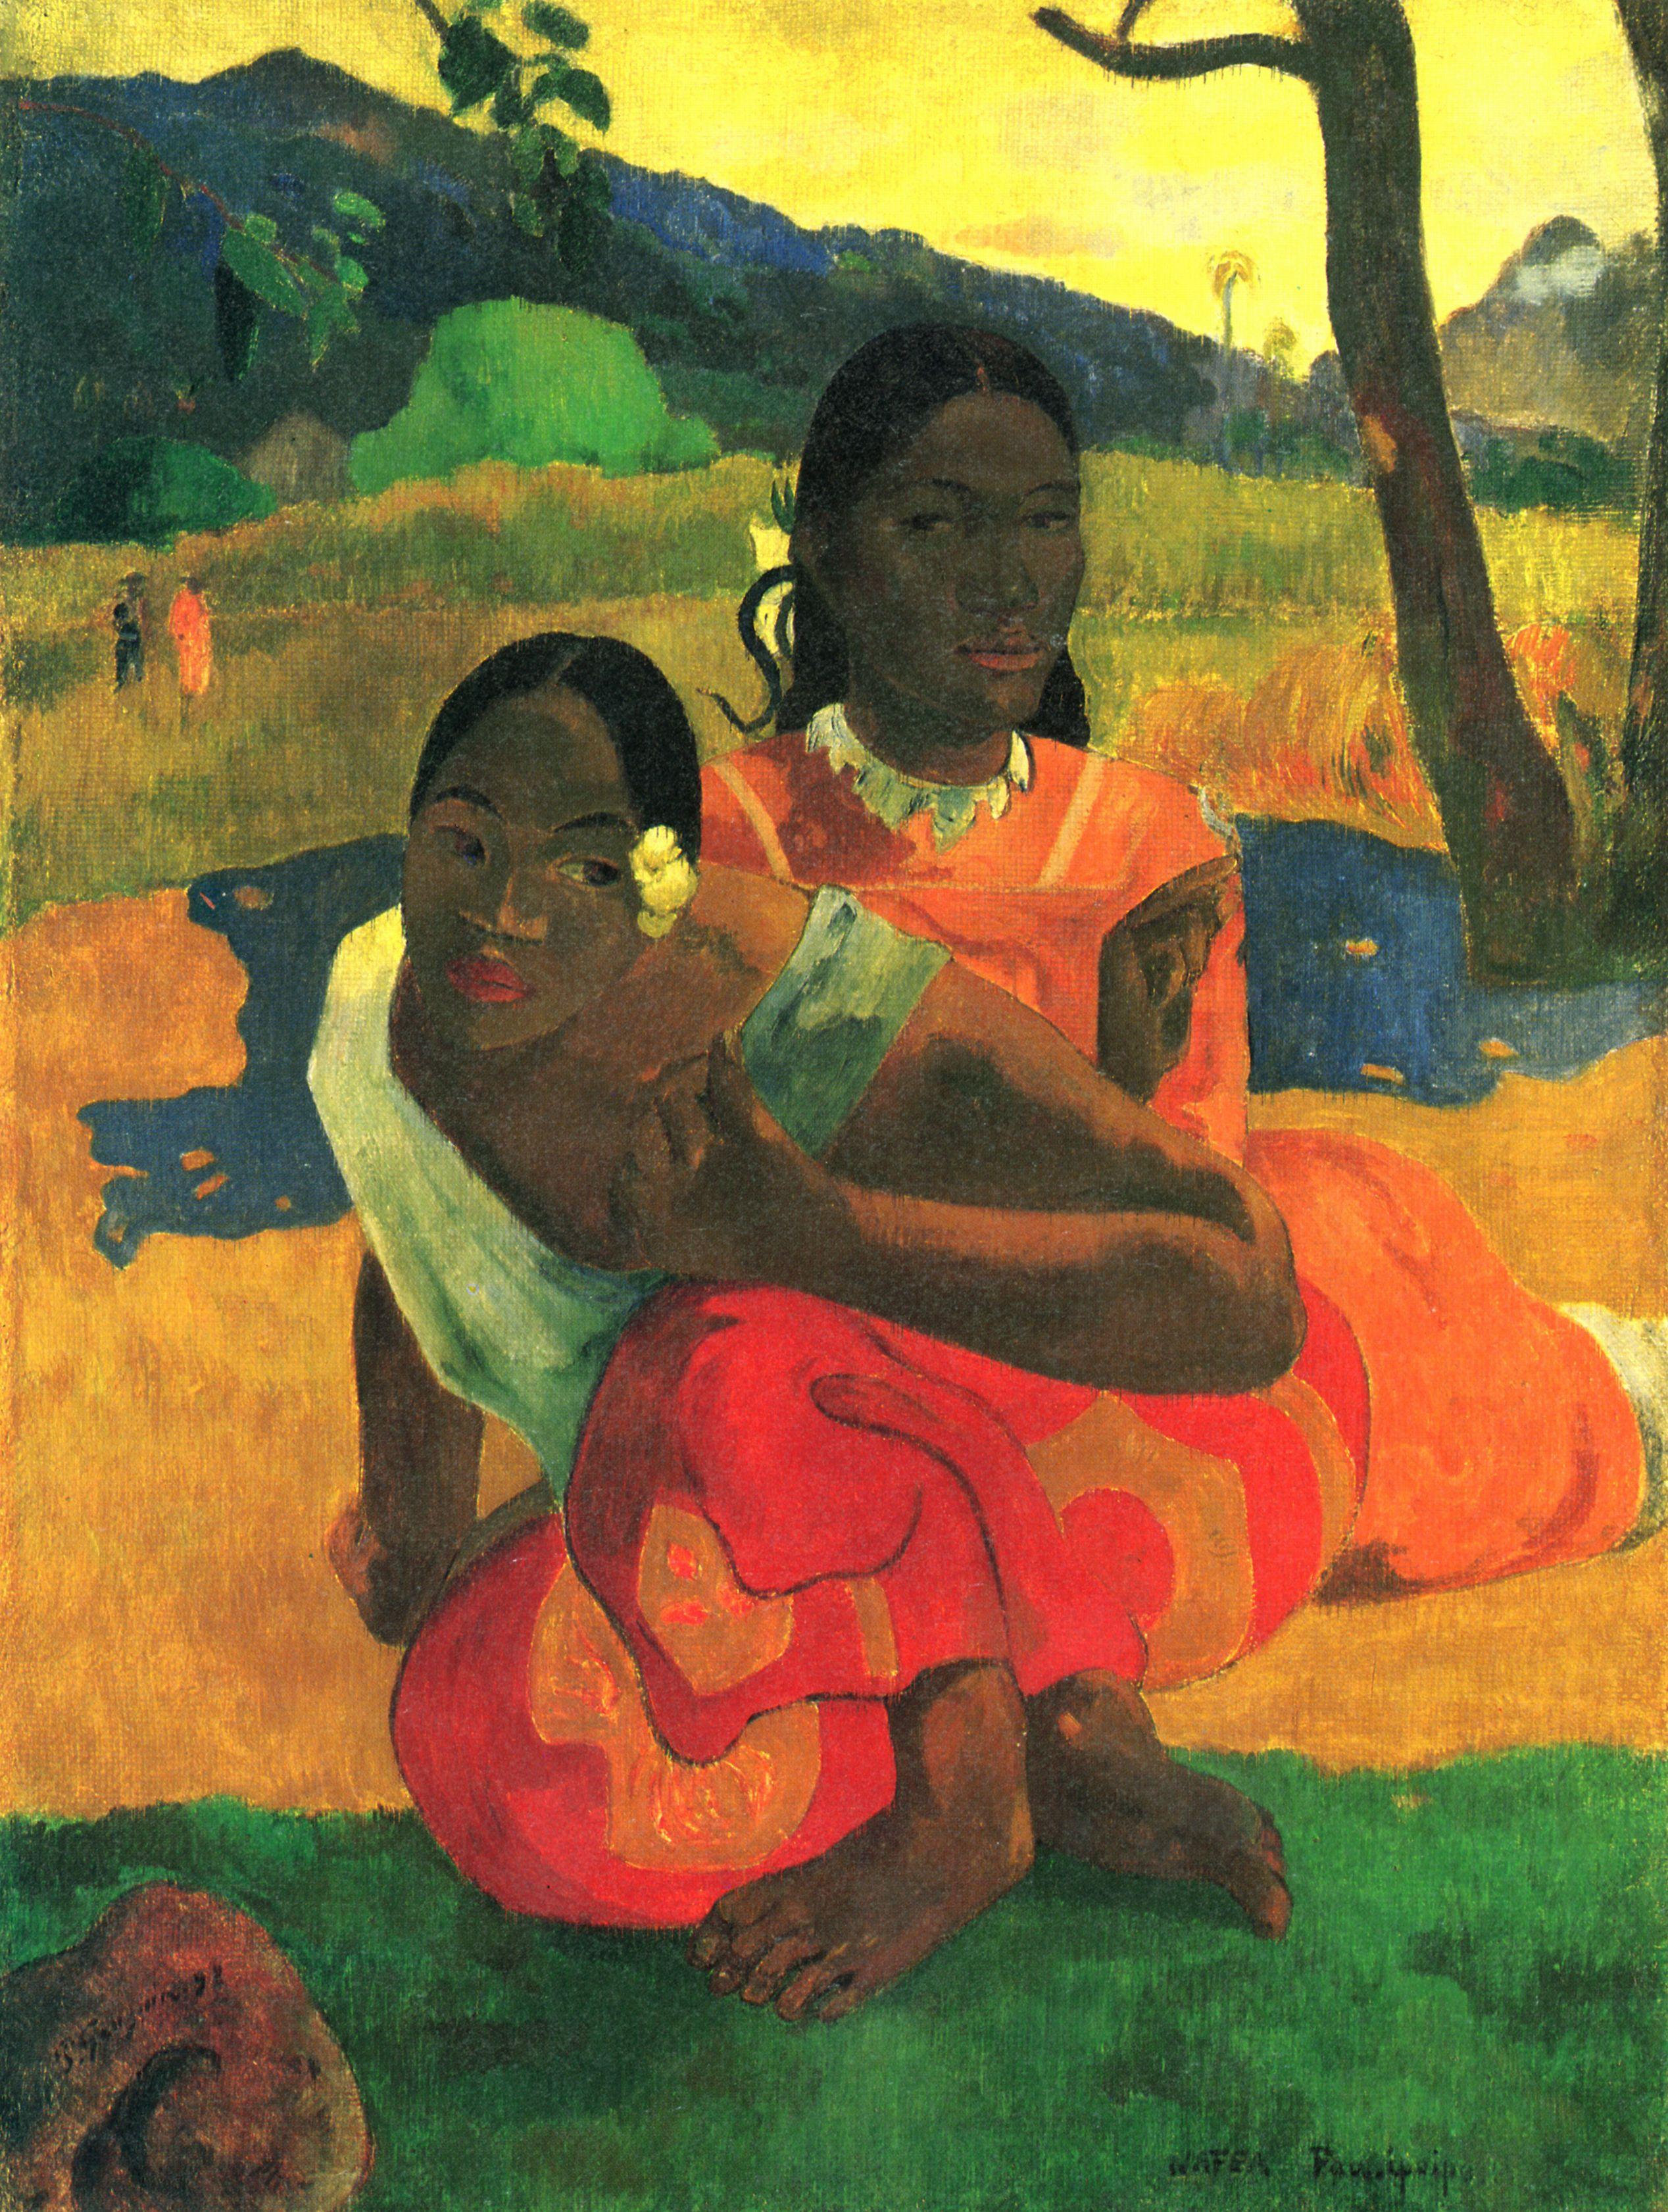 paul-gauguin-wann-heiratest-du-nafea-faa-ipoipo-03461